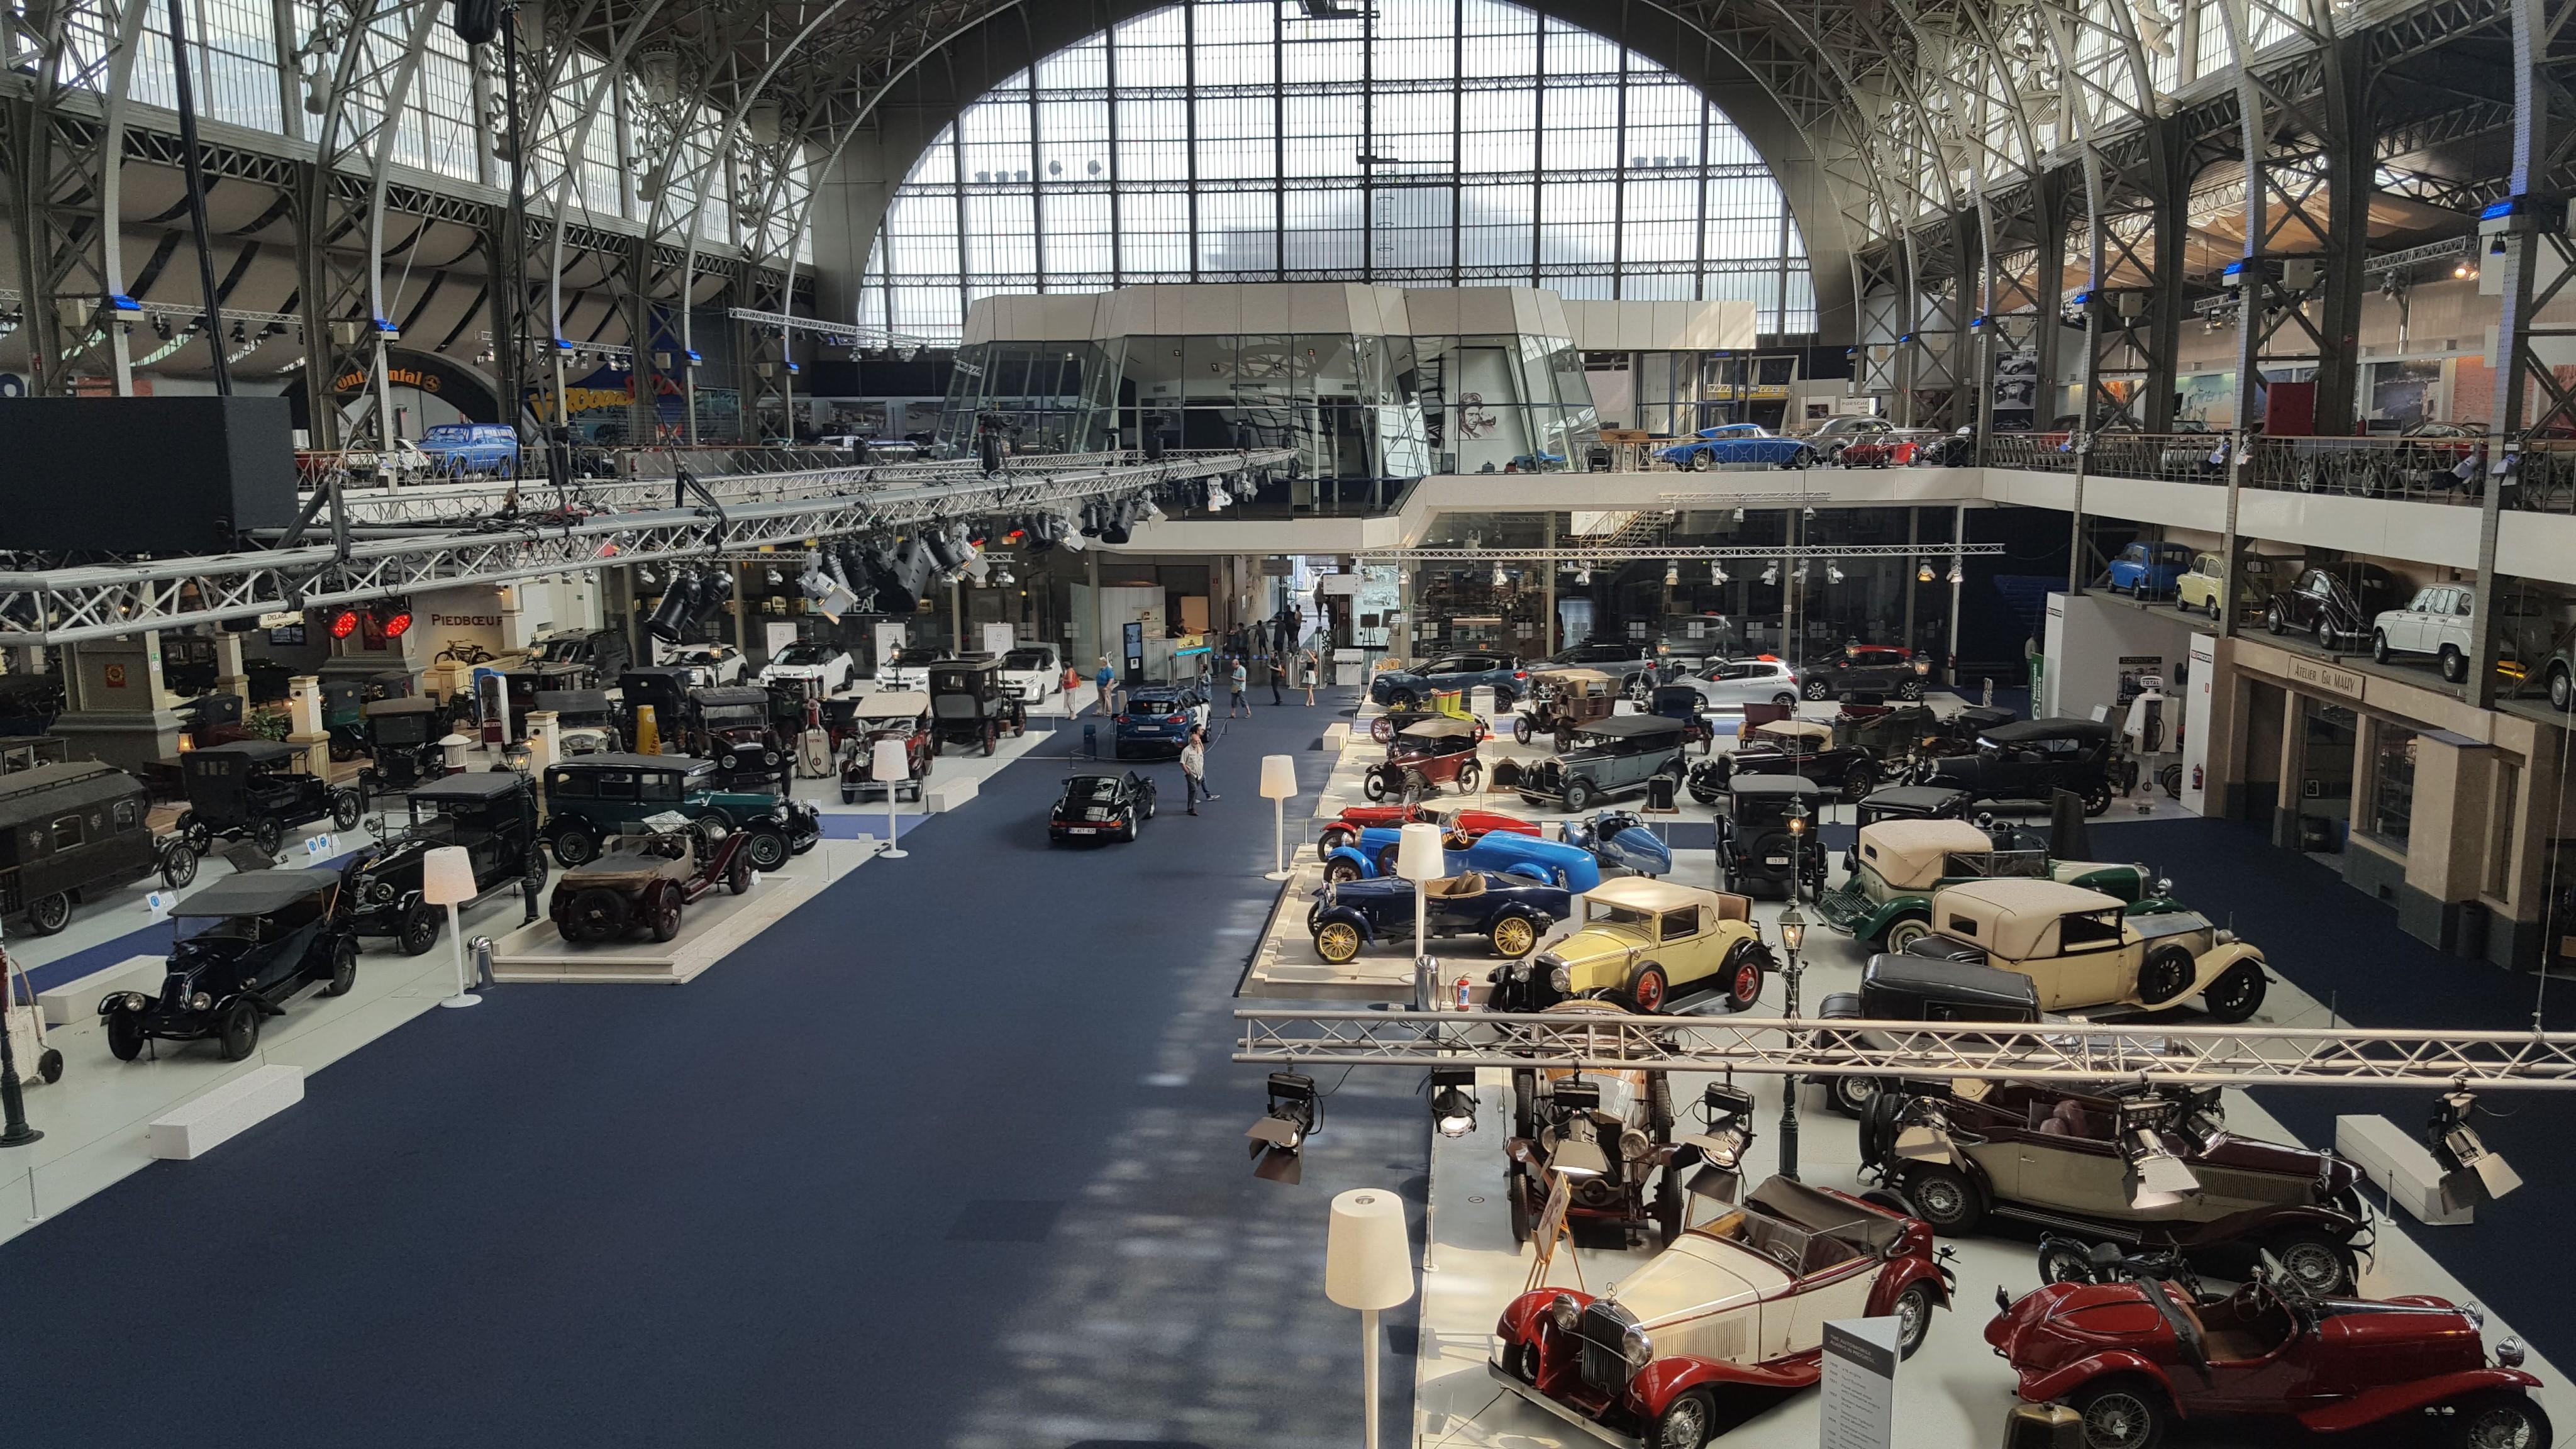 Muzeul automobilelor Autoworld, Bruxelles